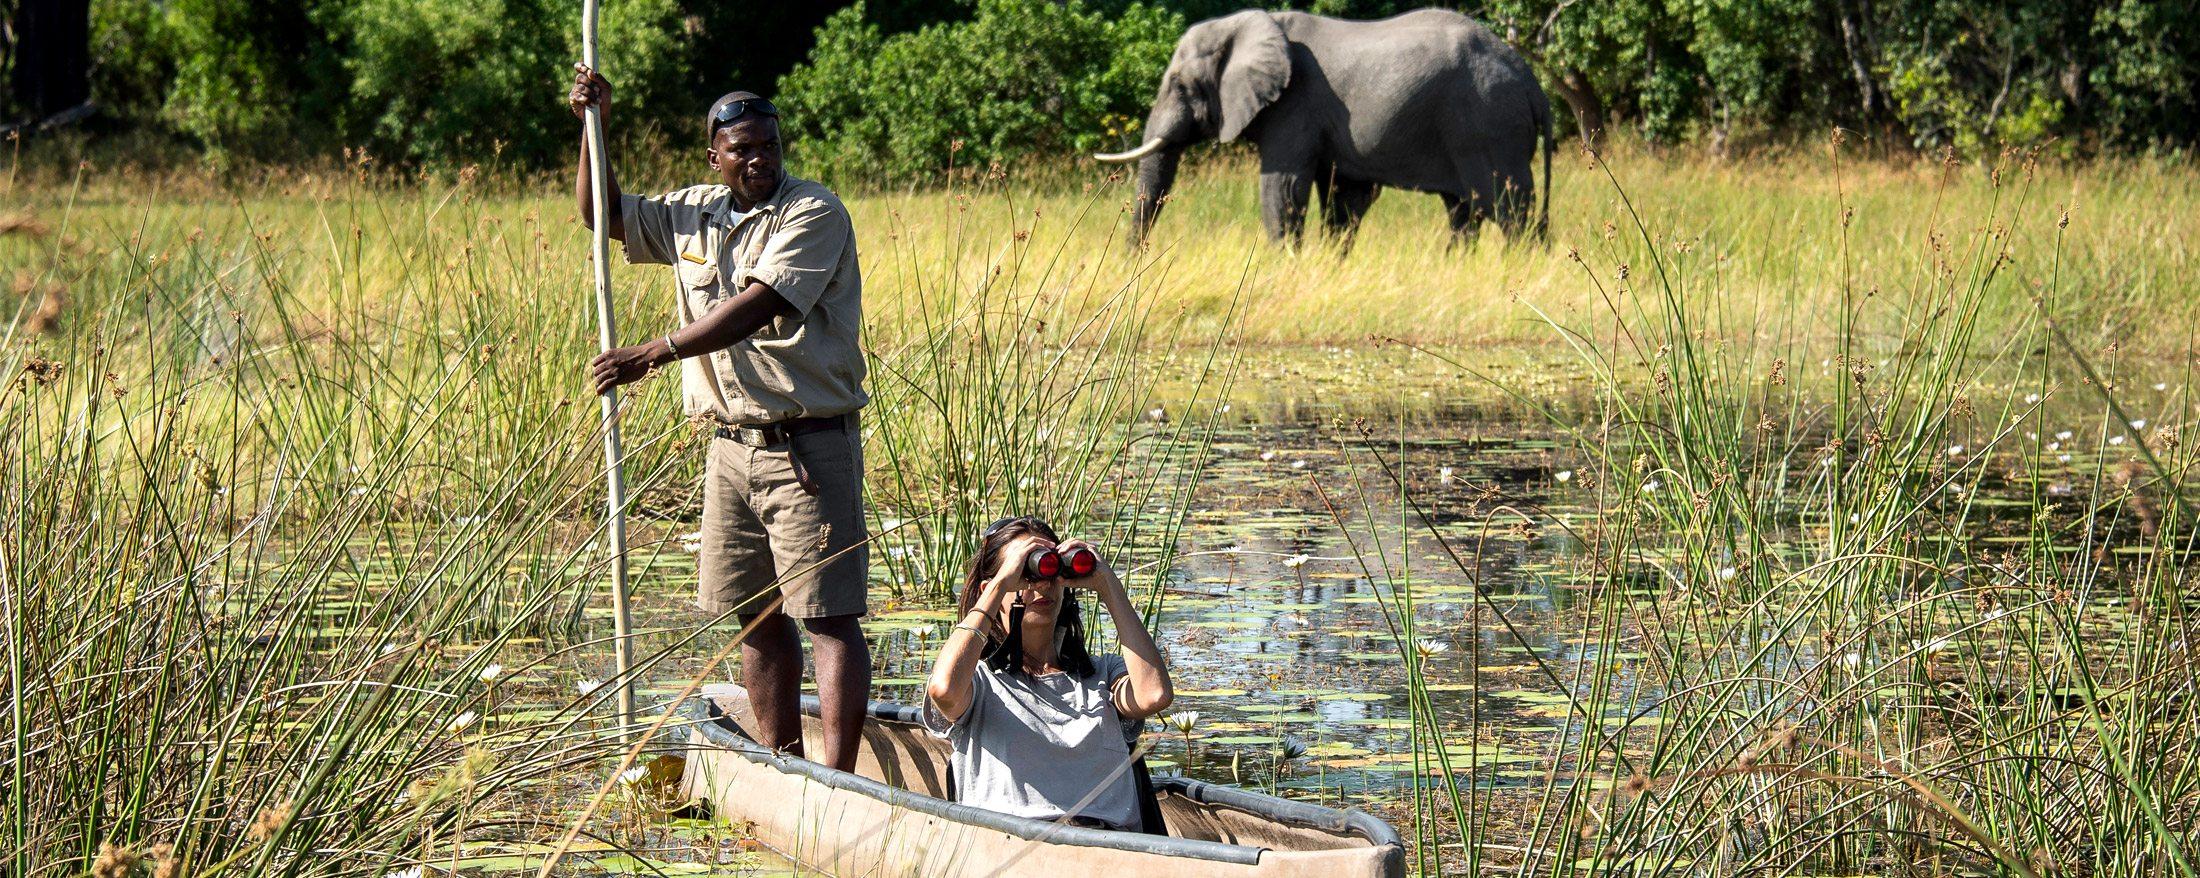 Take a mokoro safari in the Okavango Delta from Vumbura Plains.